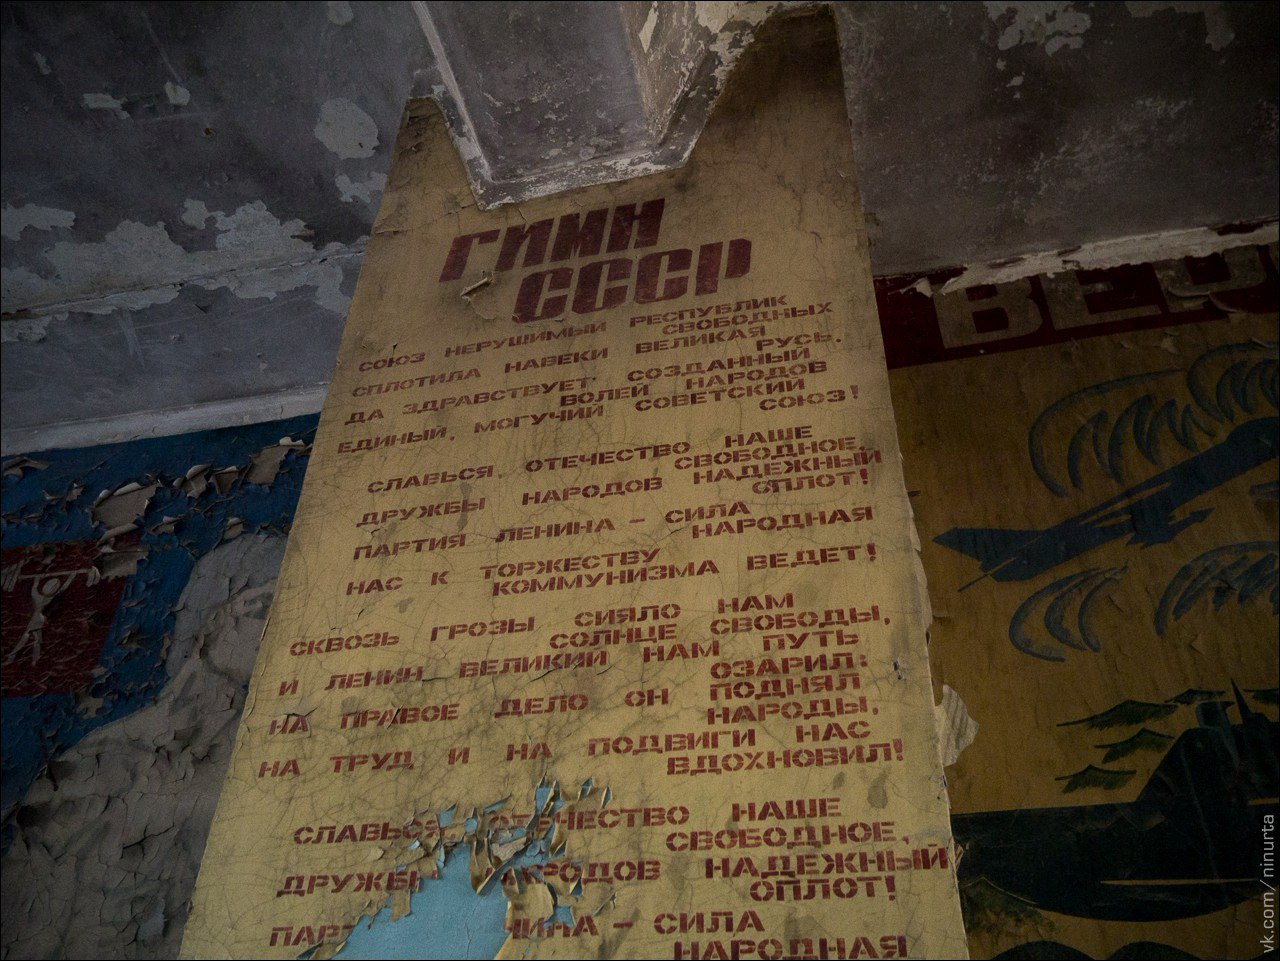 vozrozhdenya-island-kantubek-abandoned-town-16 Остров Возрождения: от царей до призраков